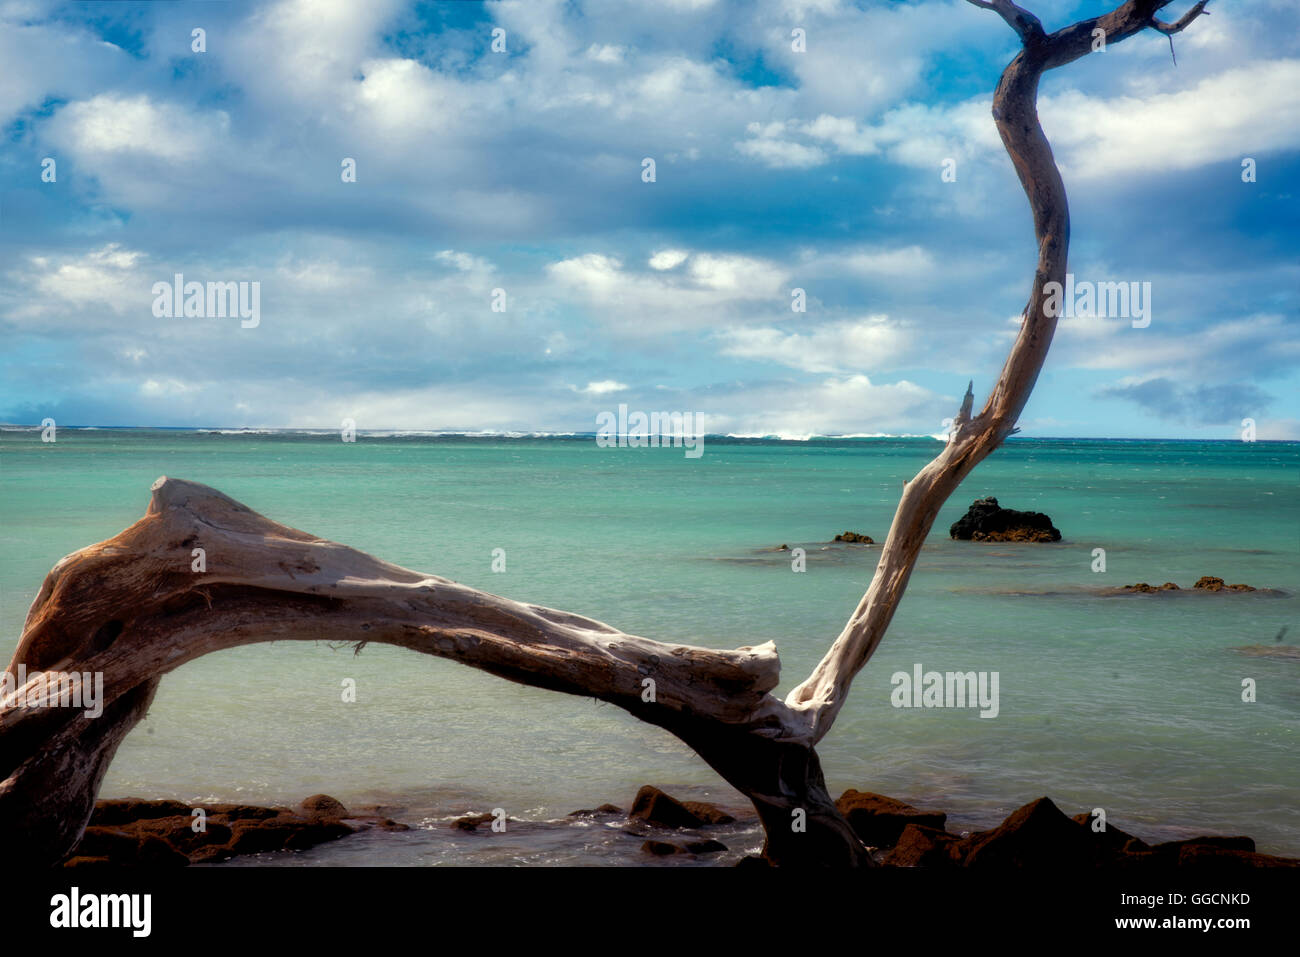 Ast und Ozean. Hawaiis Big Island. Stockbild